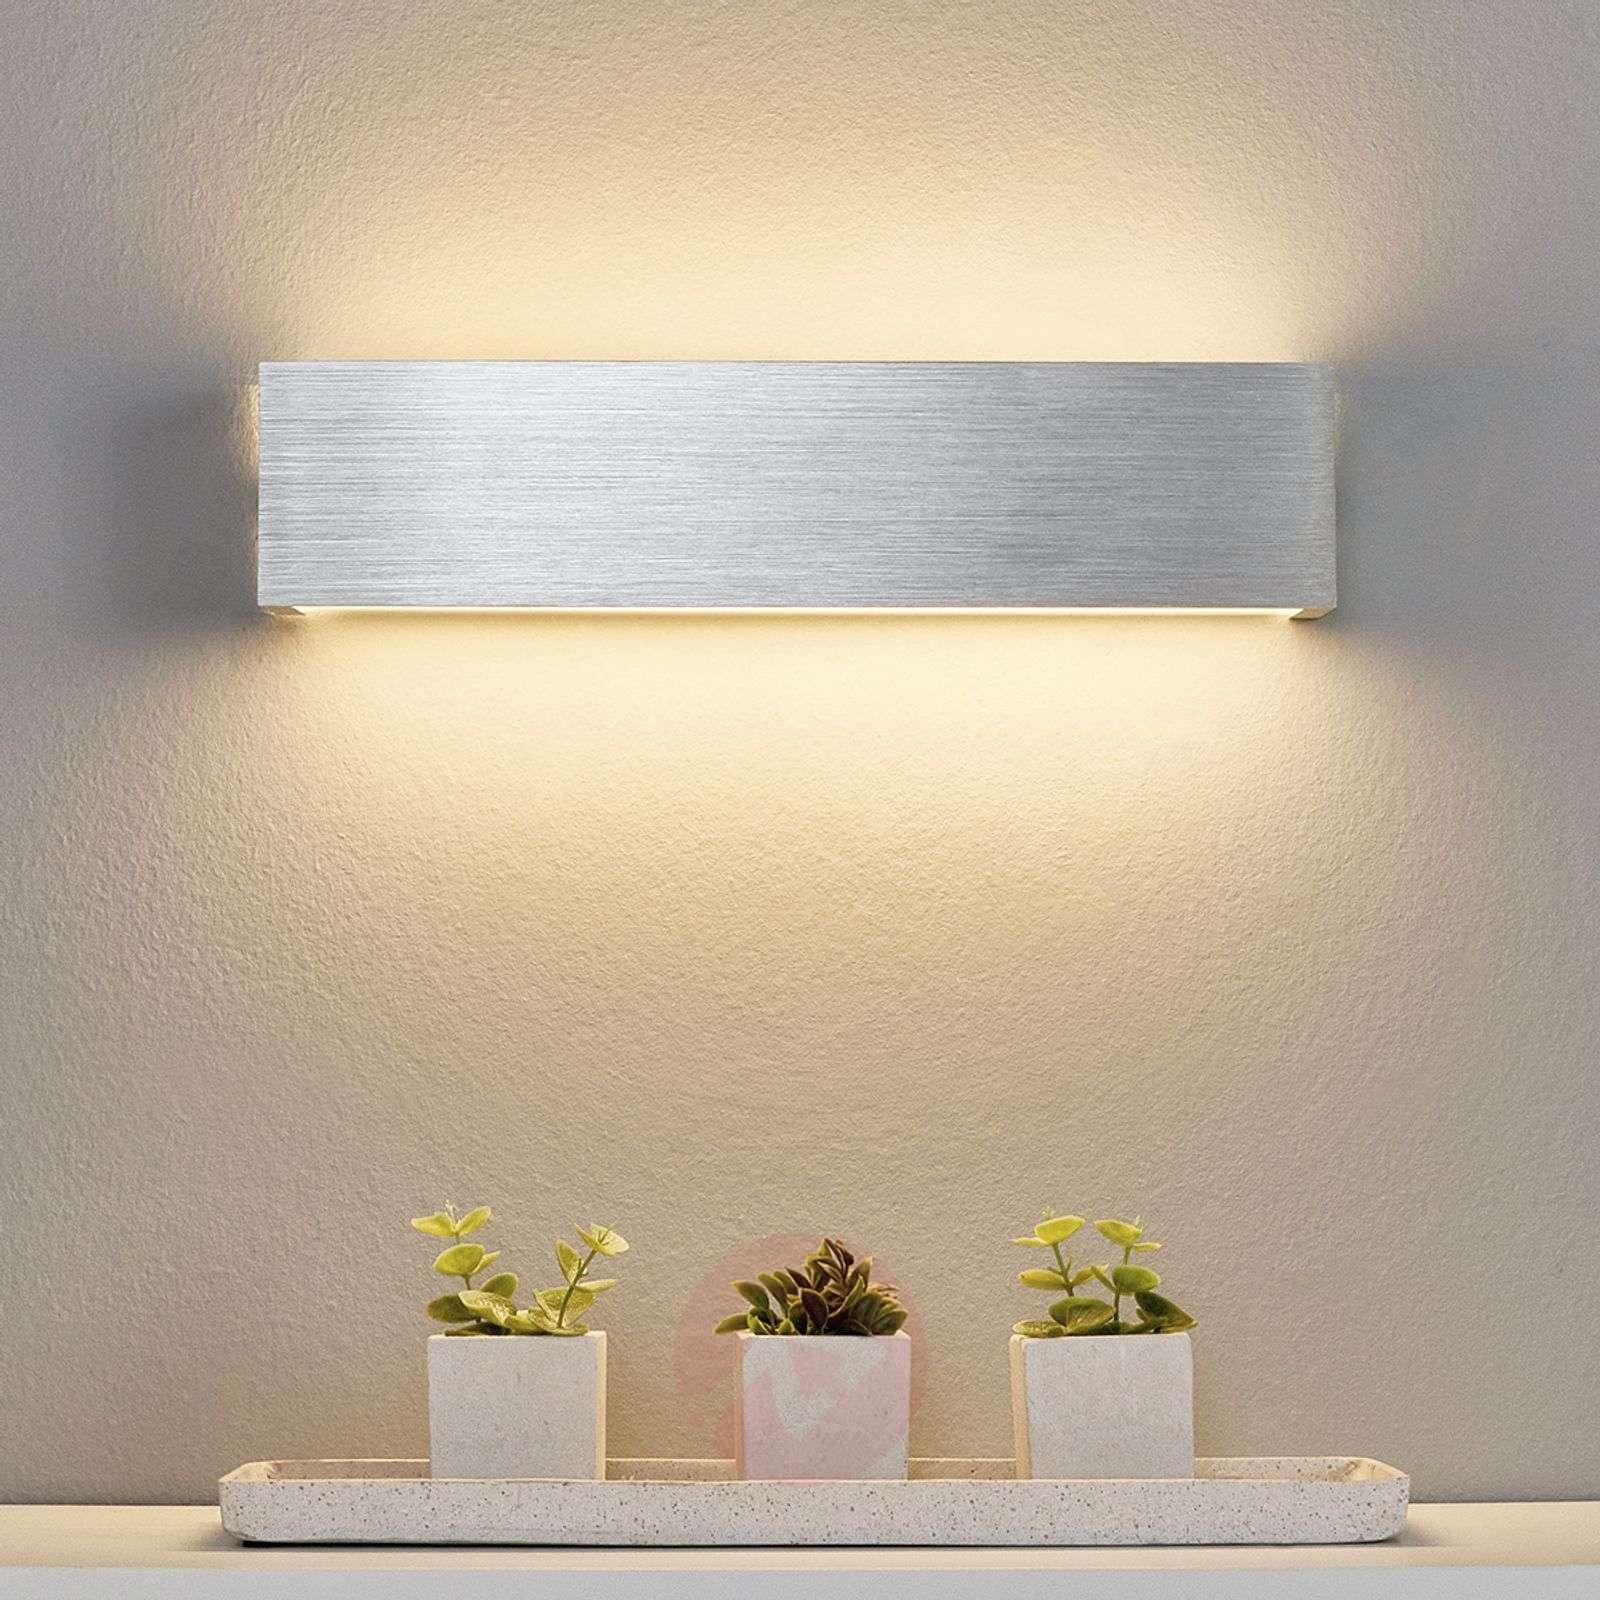 Aluminium-coloured LED wall light Ranik-9625048-01